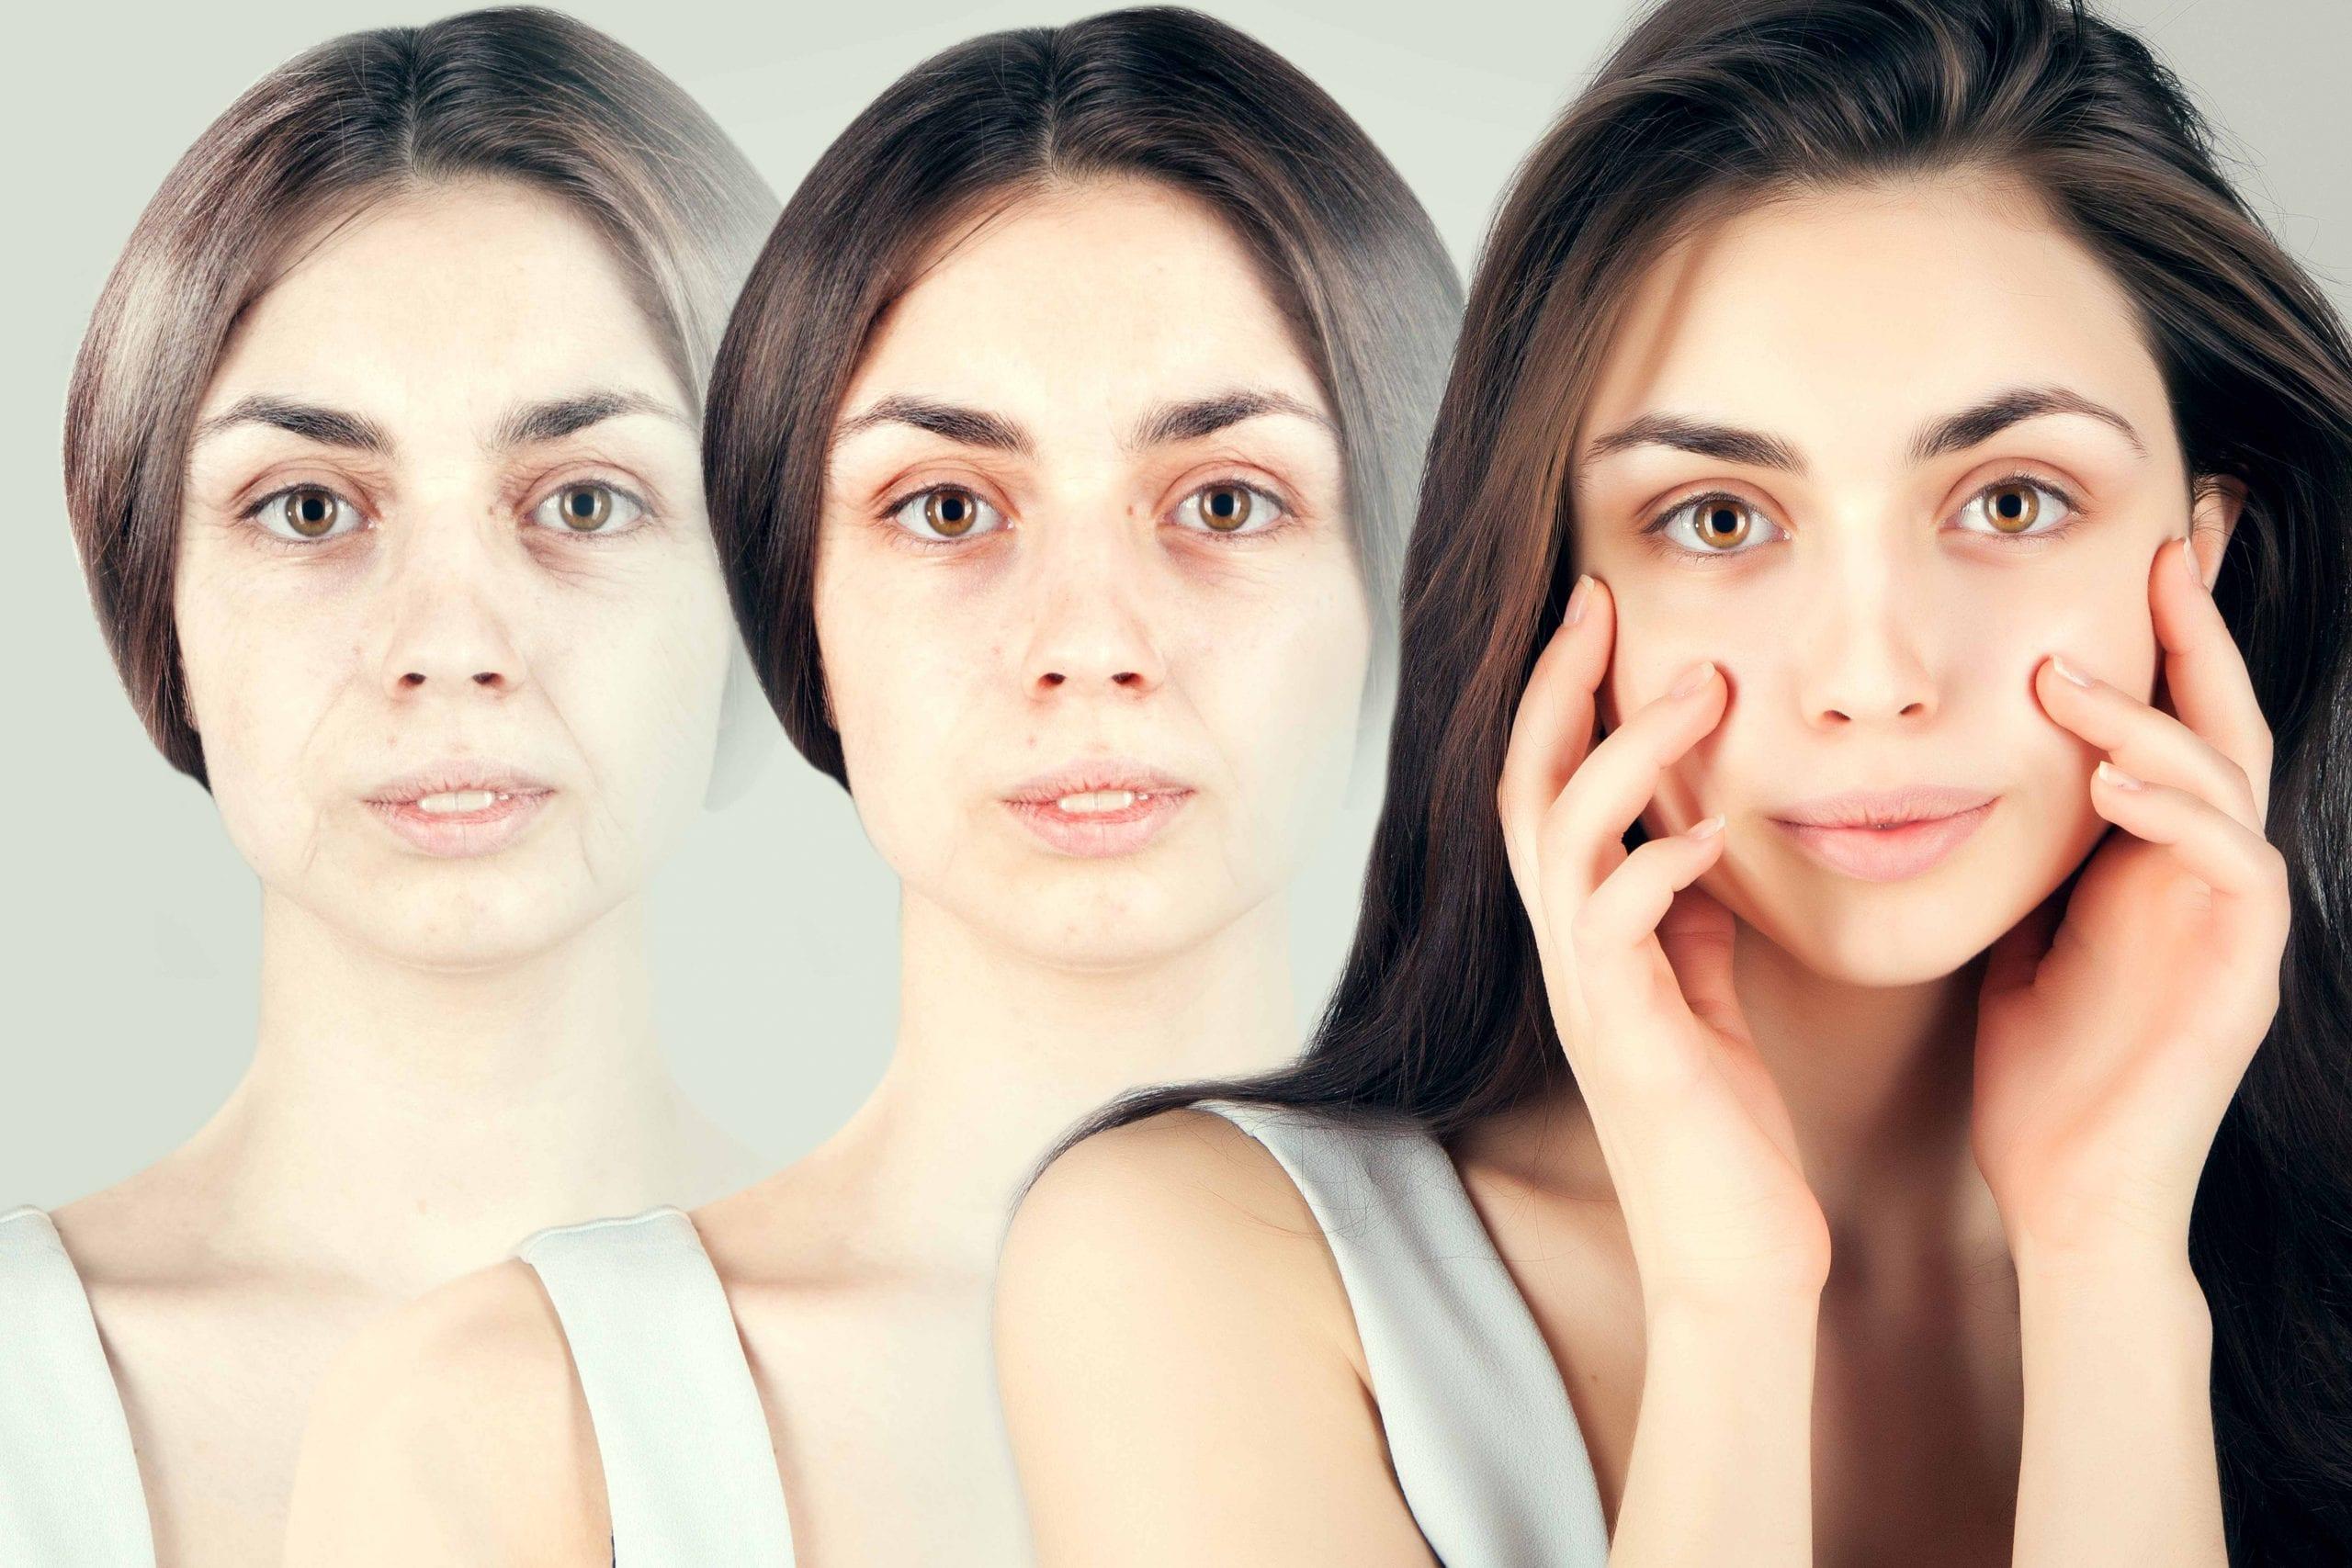 גיל פנימי וחיצוני